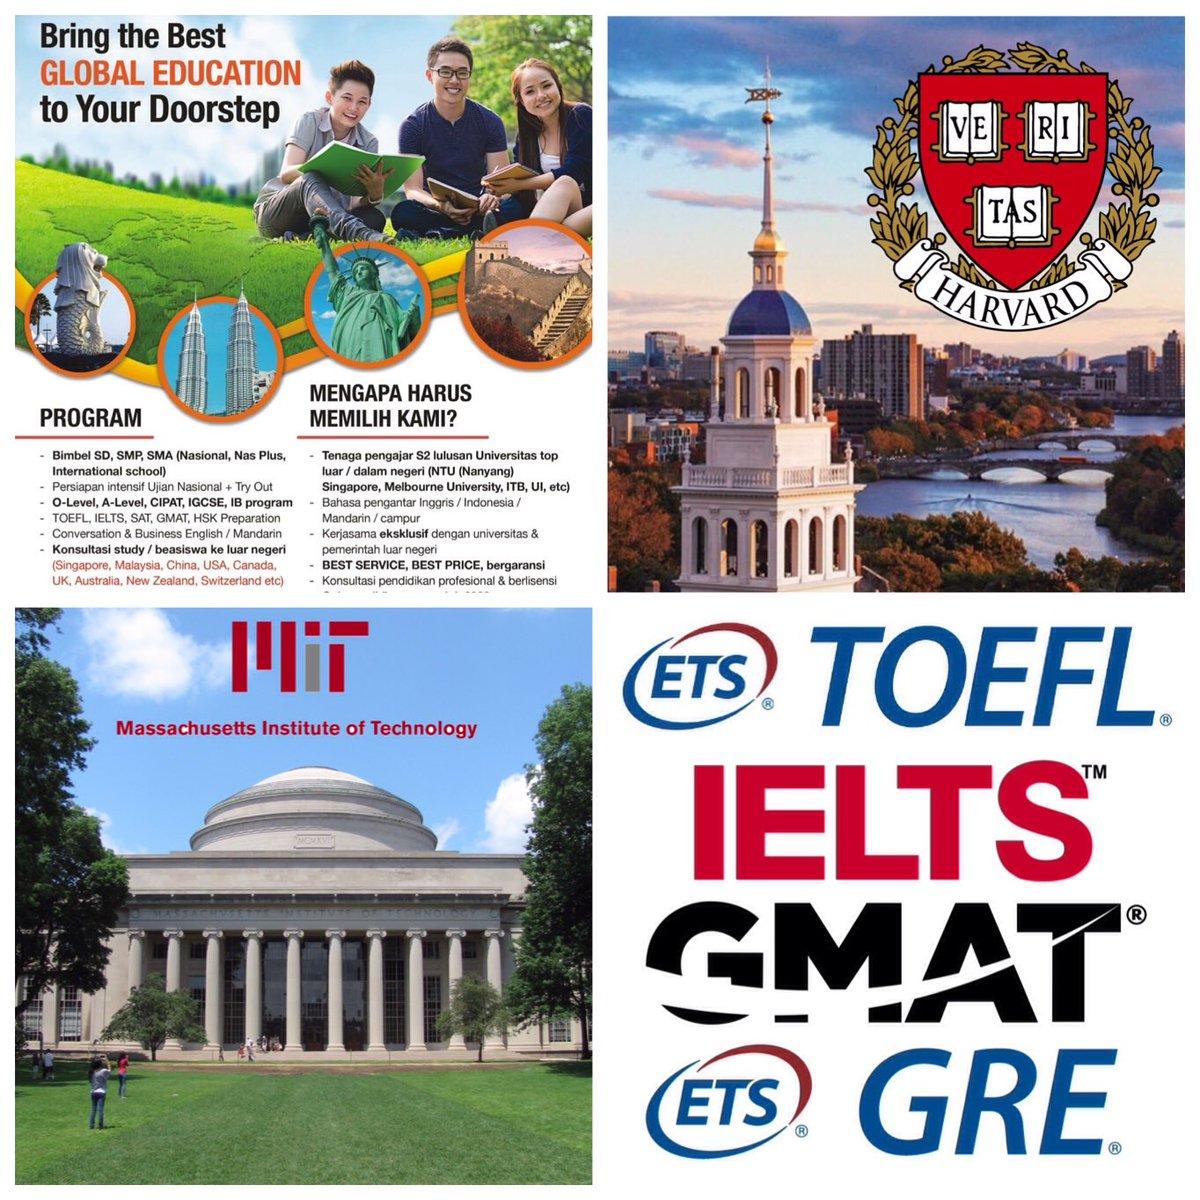 Pusat Persiapan Test #TOEFL #IELTS #GMAT #GRE #SAT #IGCSE #TOEIC • konsultasi Studi/Beasiswa ke Luar Negeri • (031)3816827 • PERTAMA & SATU-SATUNYA DI #SURABAYA https://t.co/ryQFbzULsT